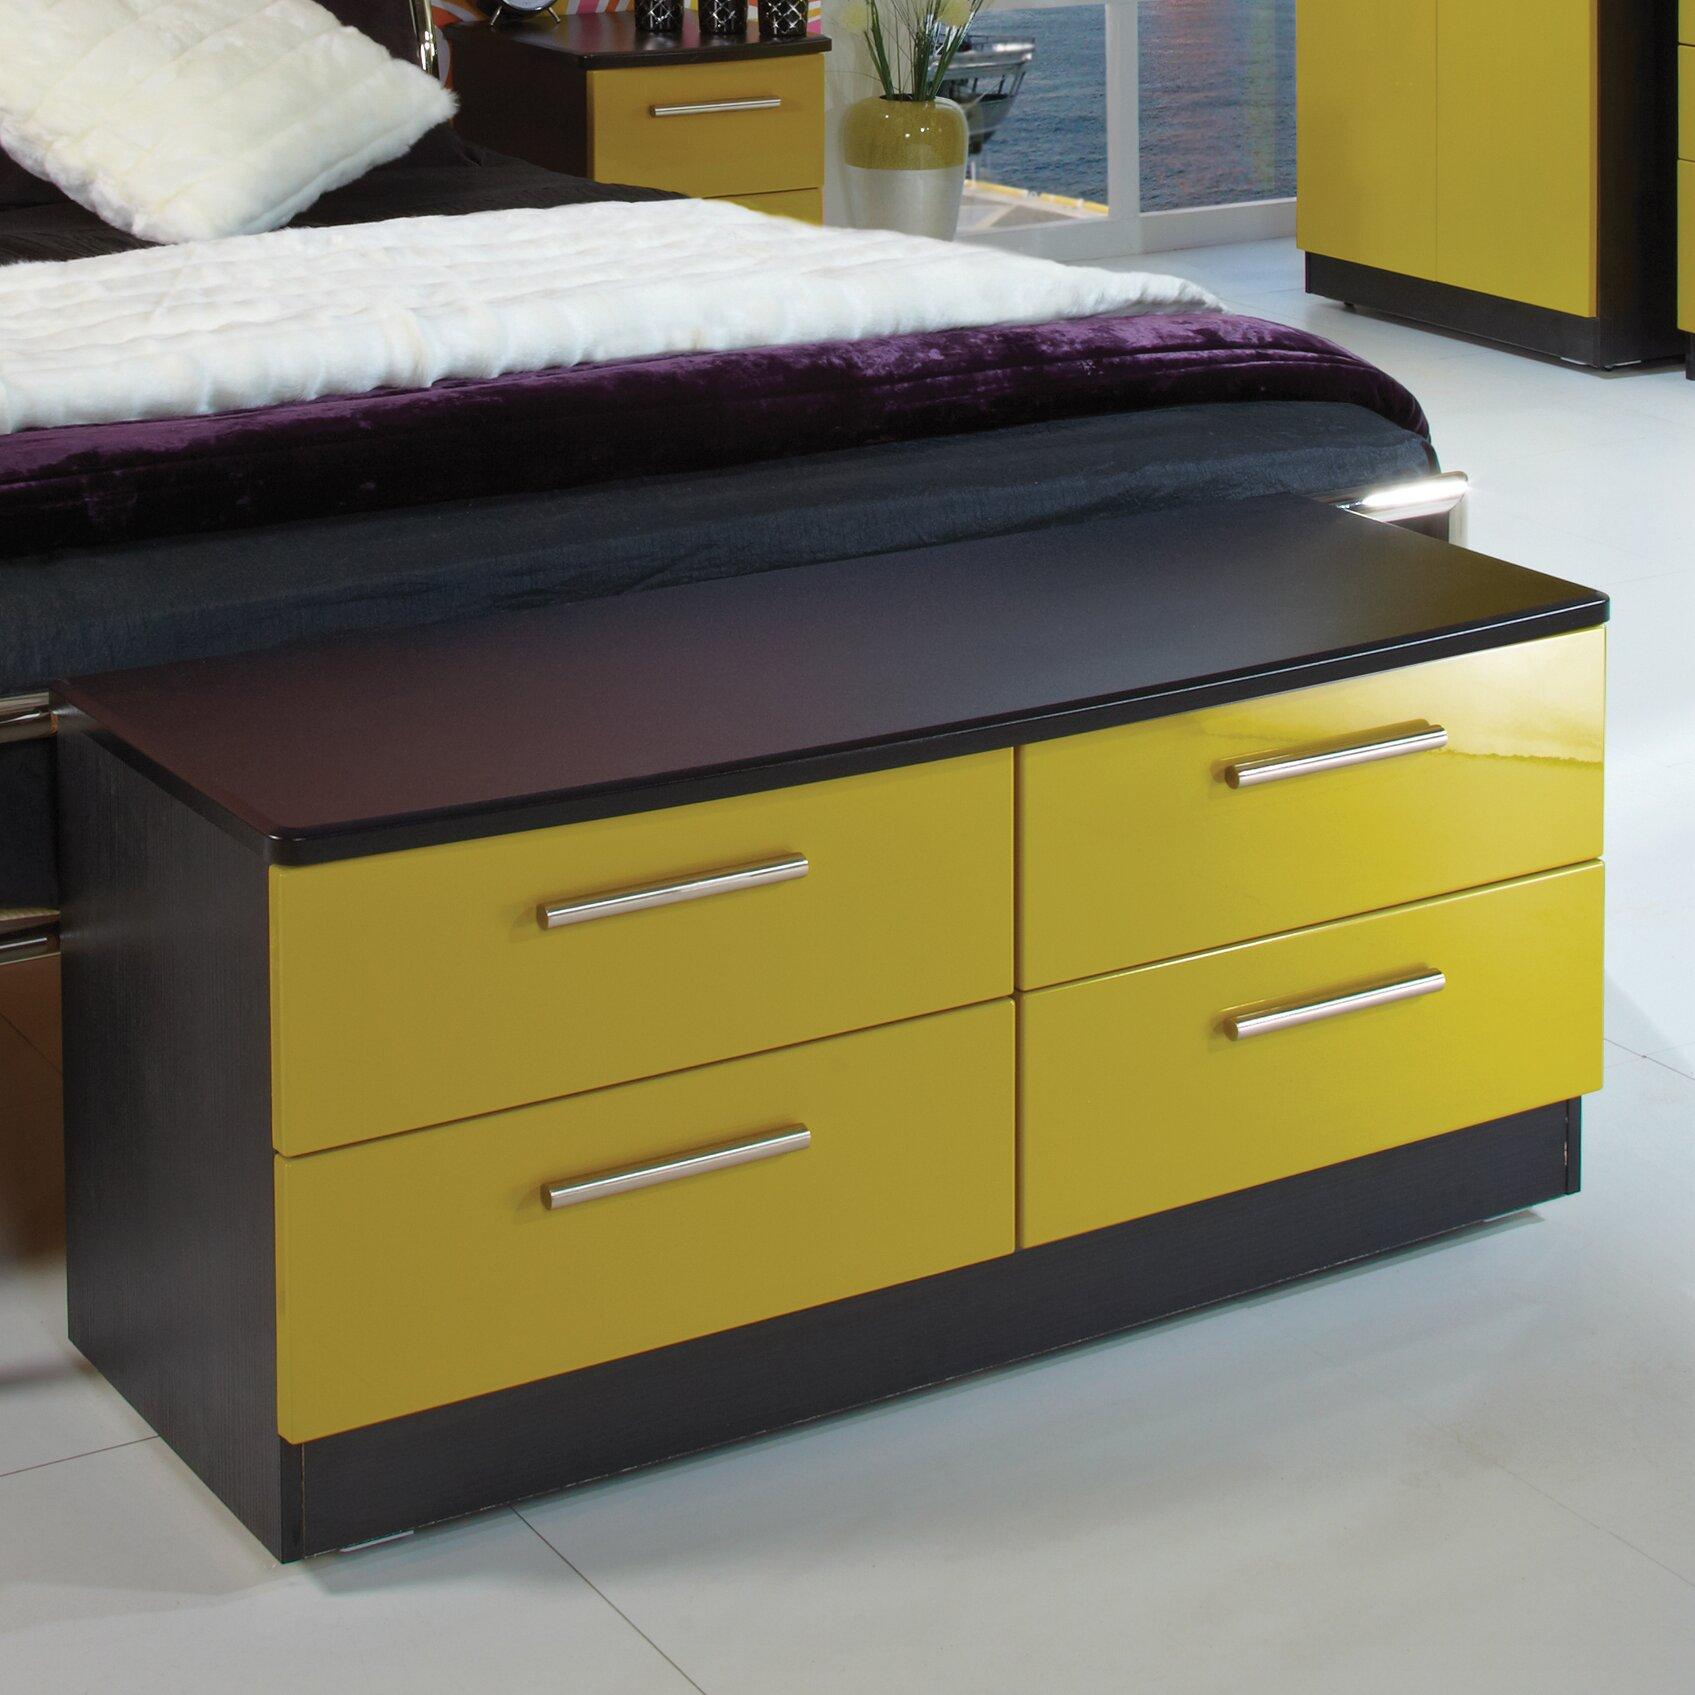 Homestead living knightsbridge drawer chest of drawers